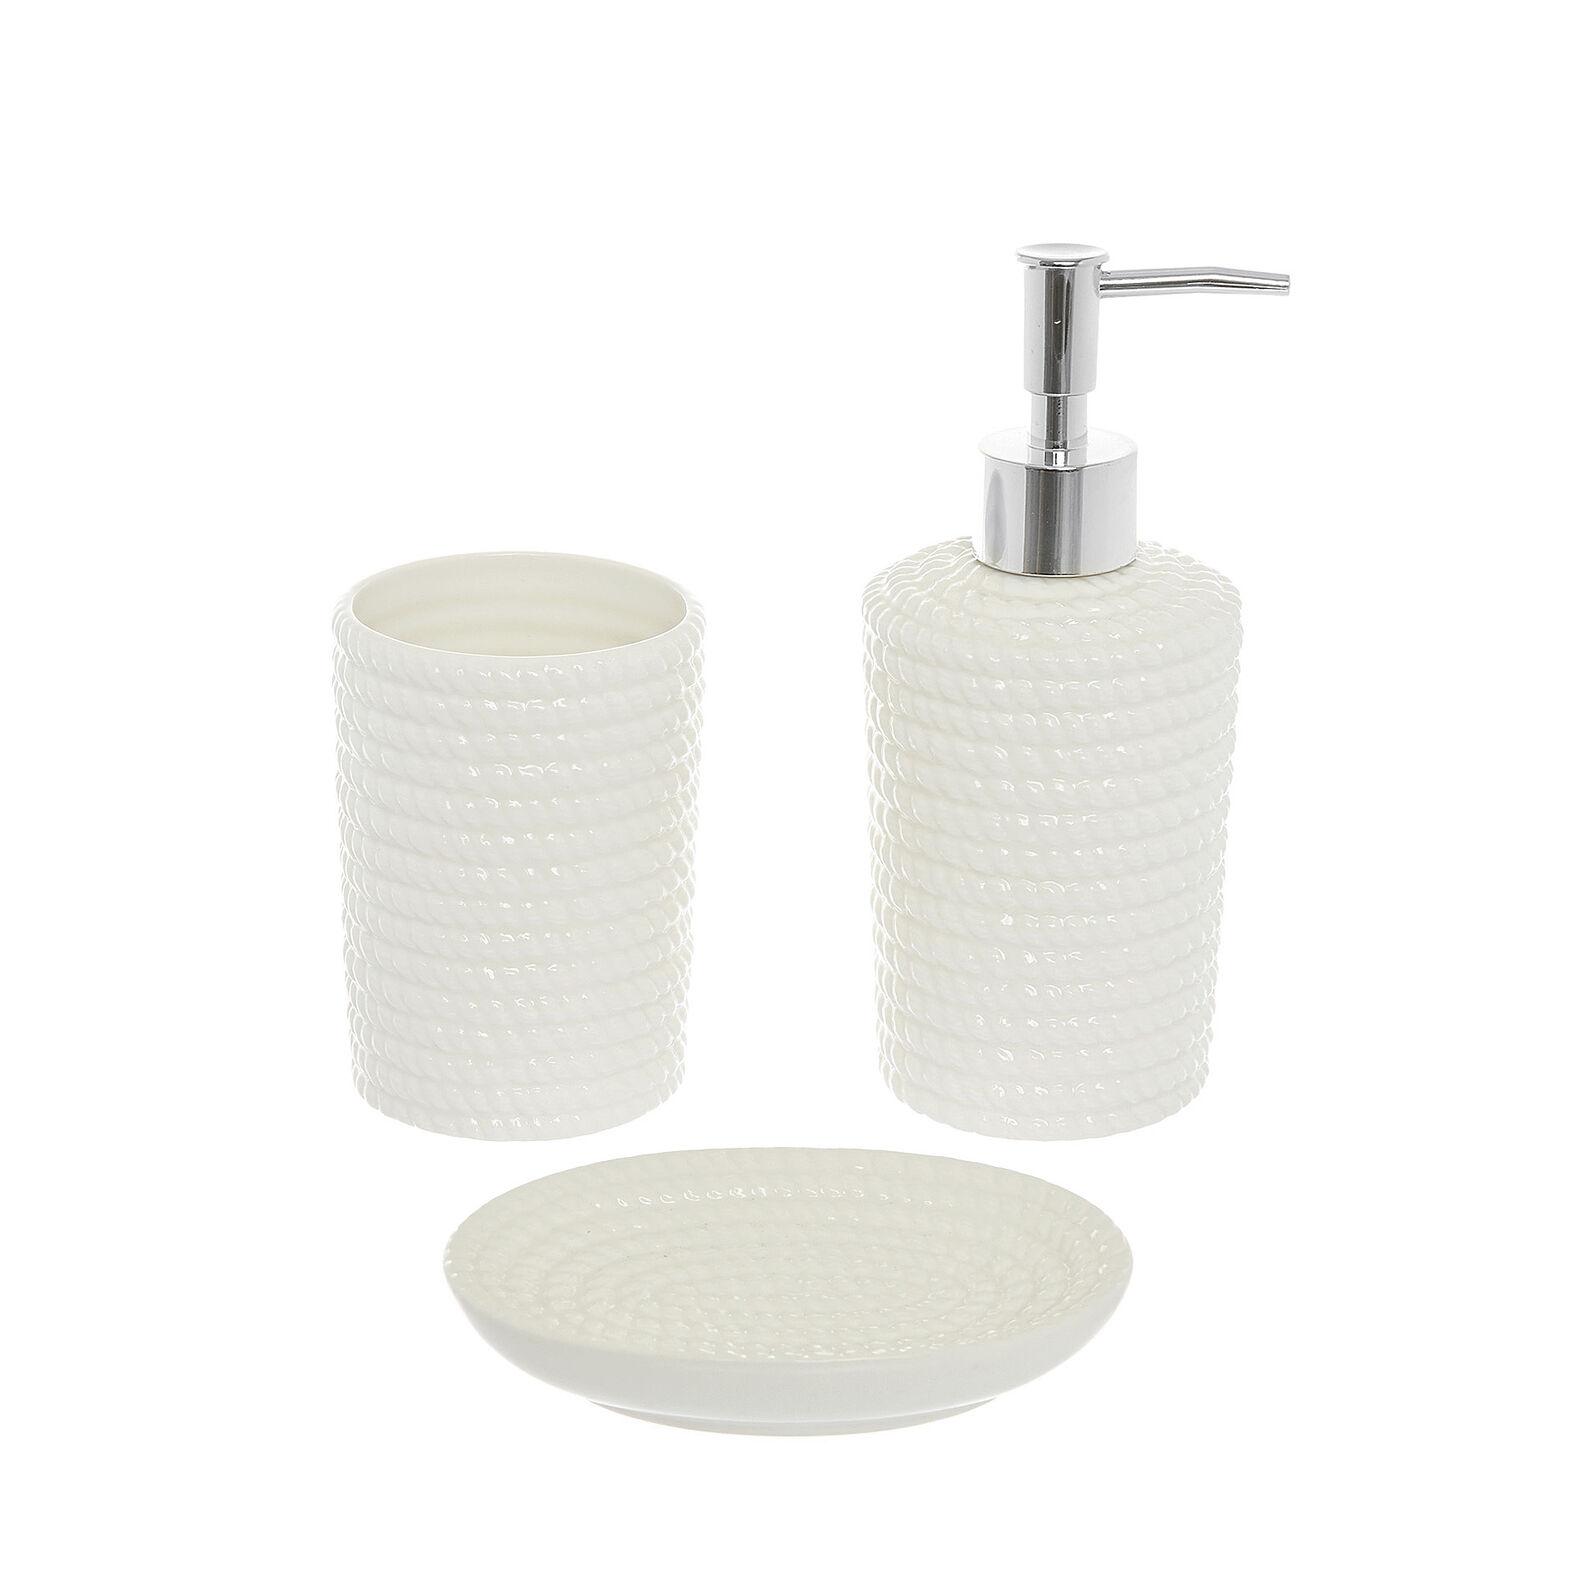 Dispenser ceramica motivo corda